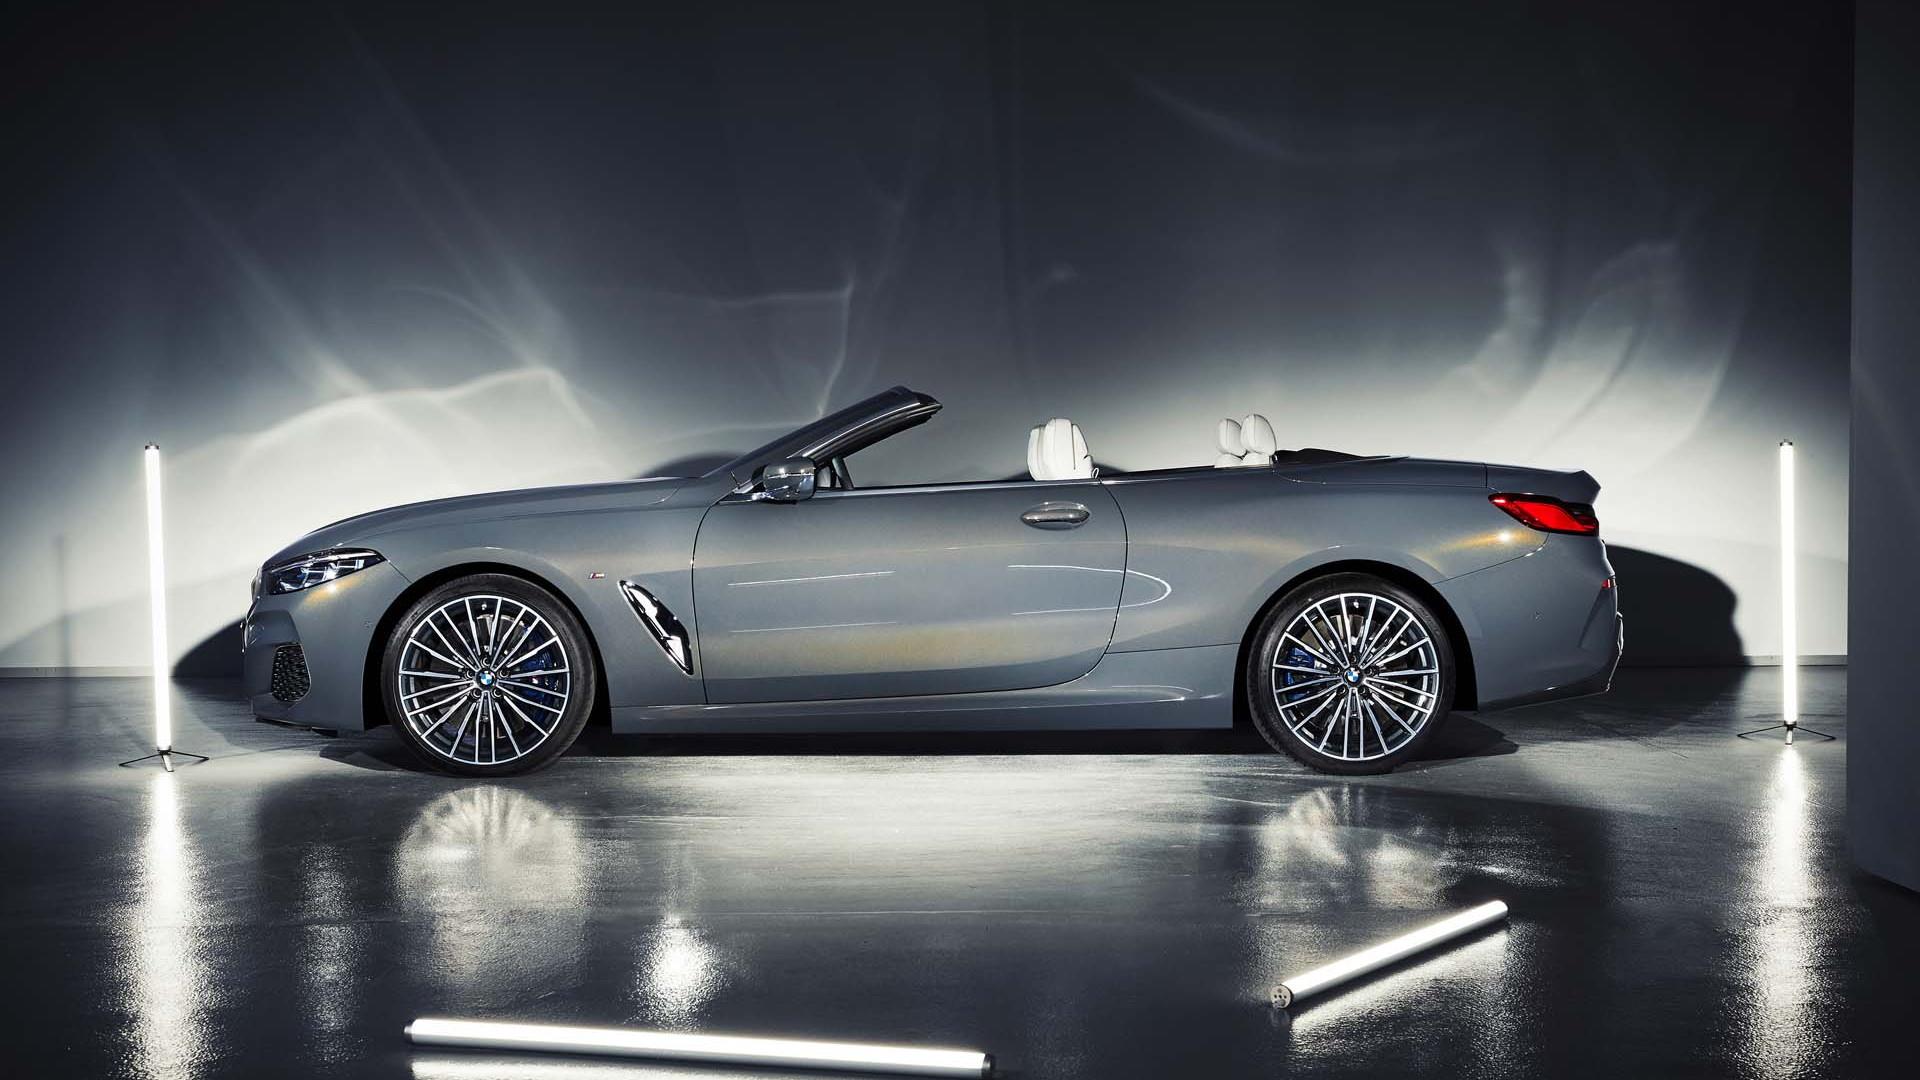 2019 BMW 8-Series Convertible (M850i xDrive Convertible)